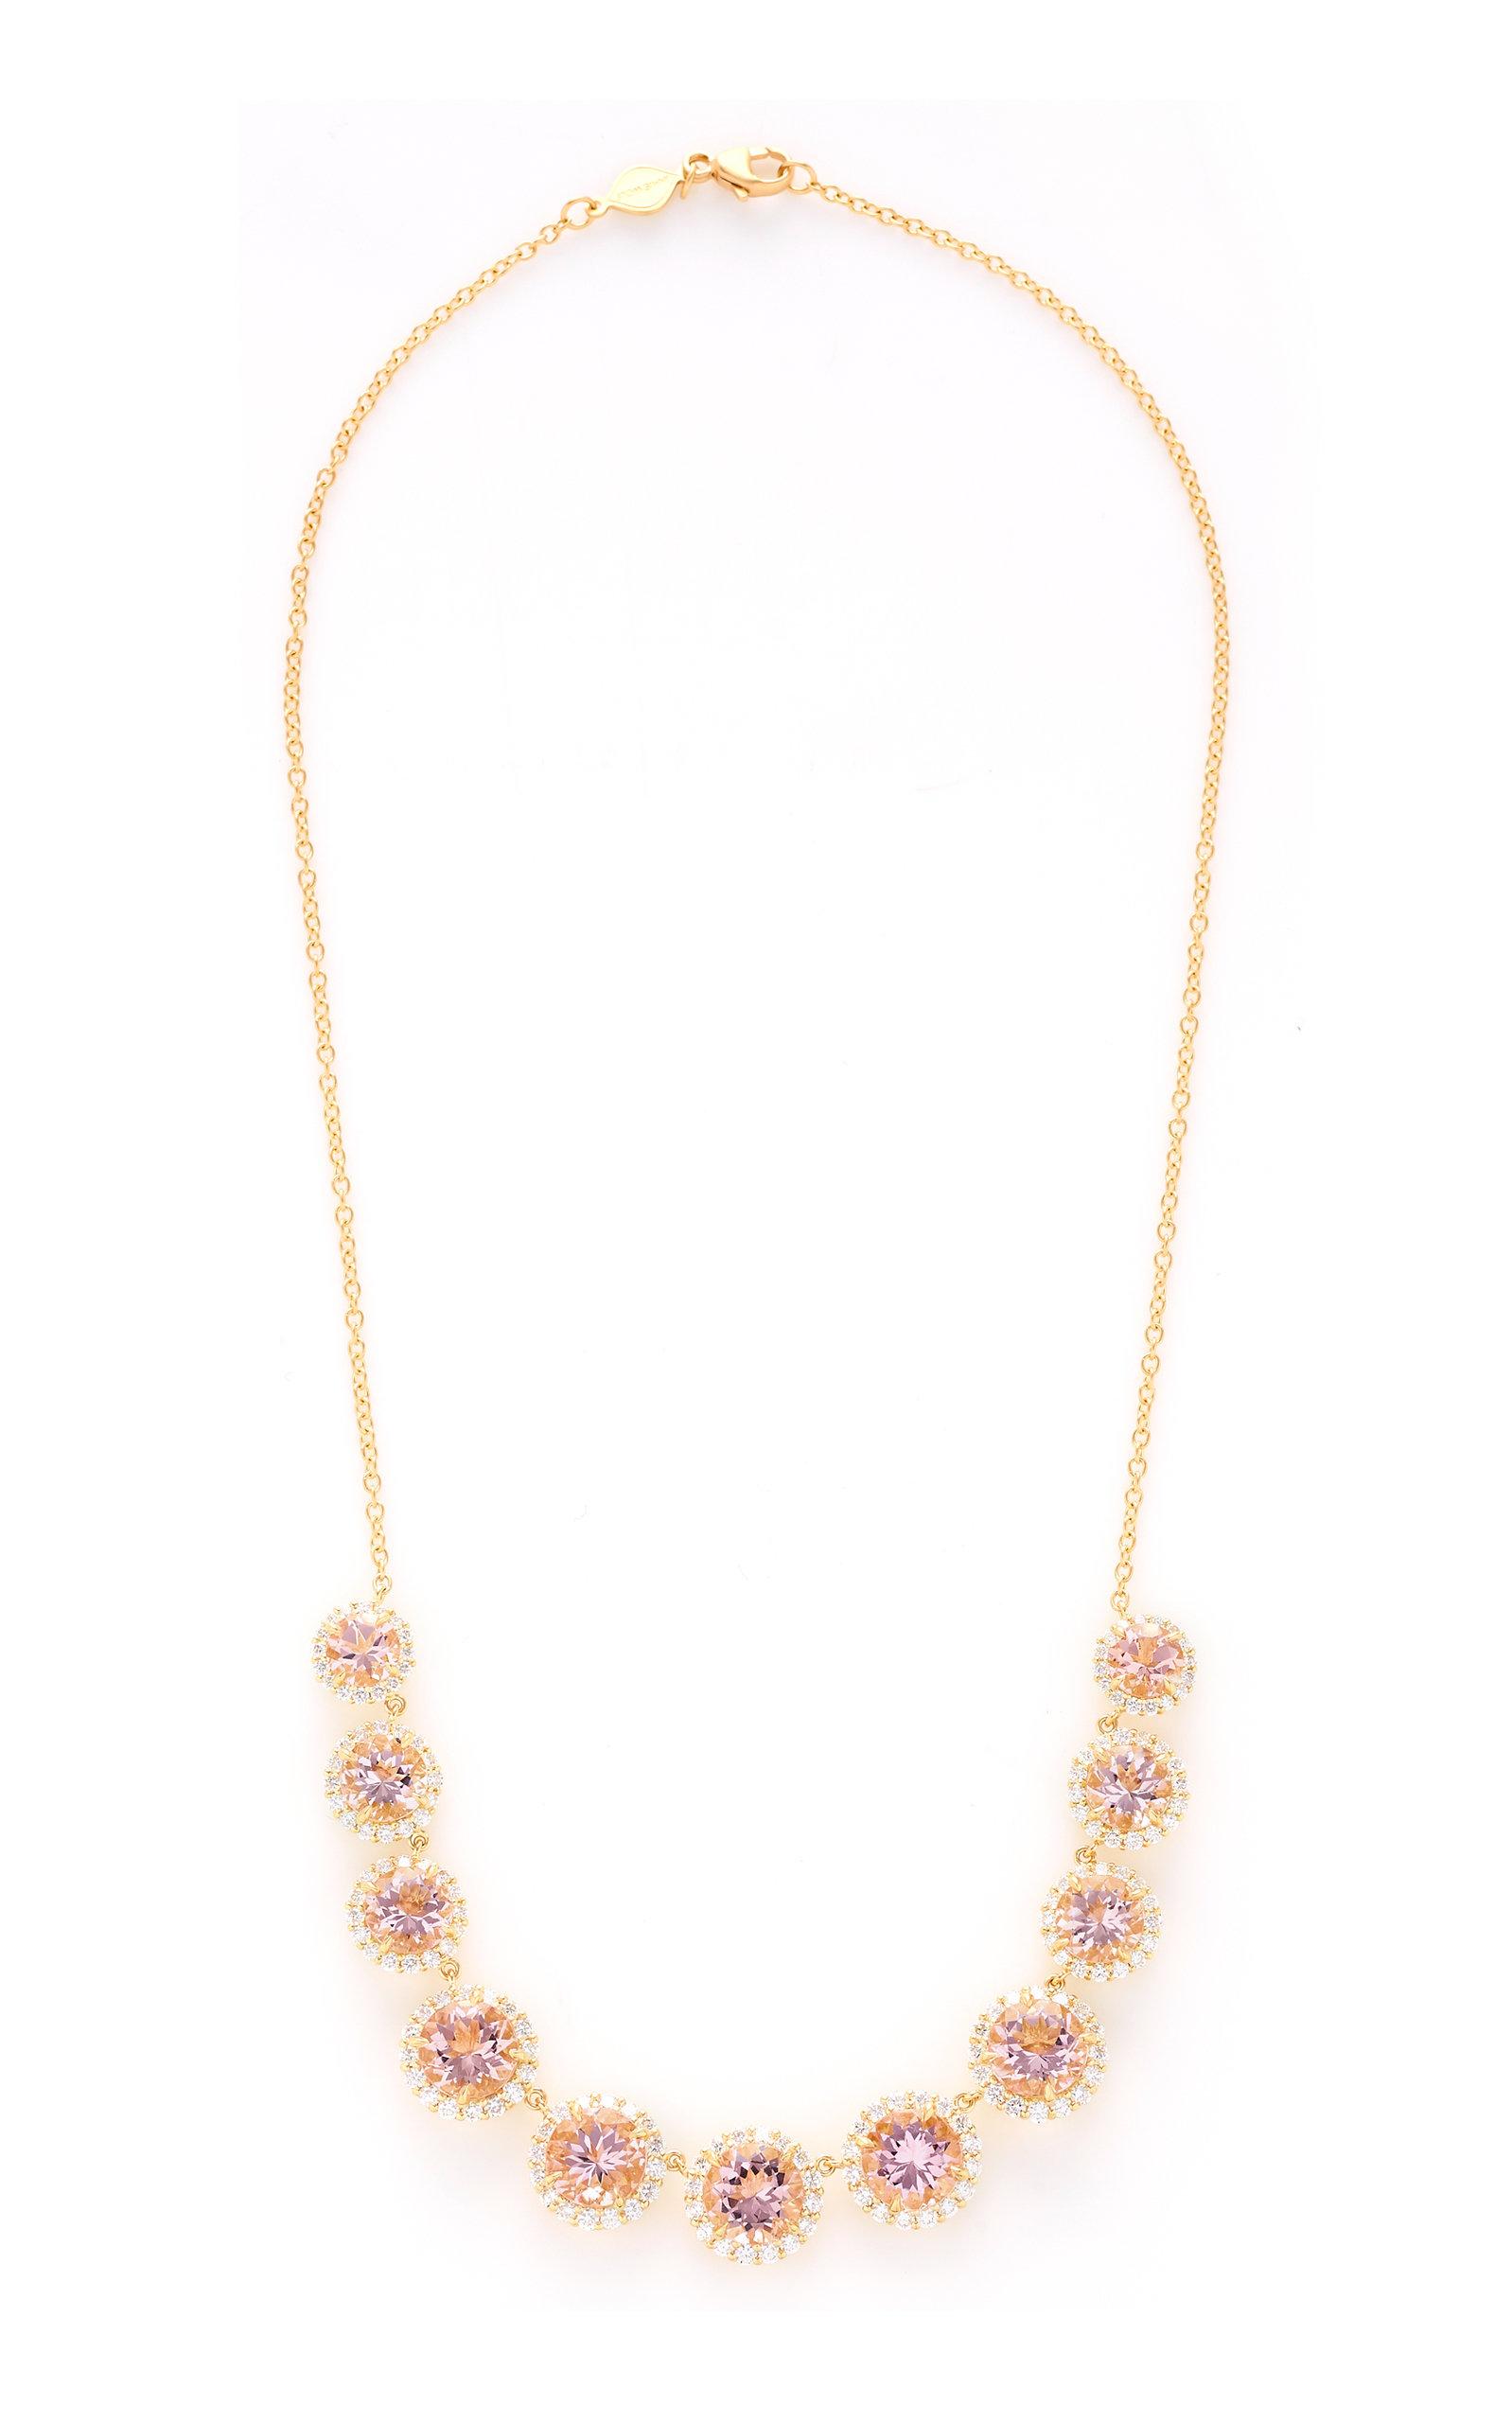 4f0489c146bcc1 18K Yellow Gold Diamond Edge Graduated Morganite Necklace by Jamie ...